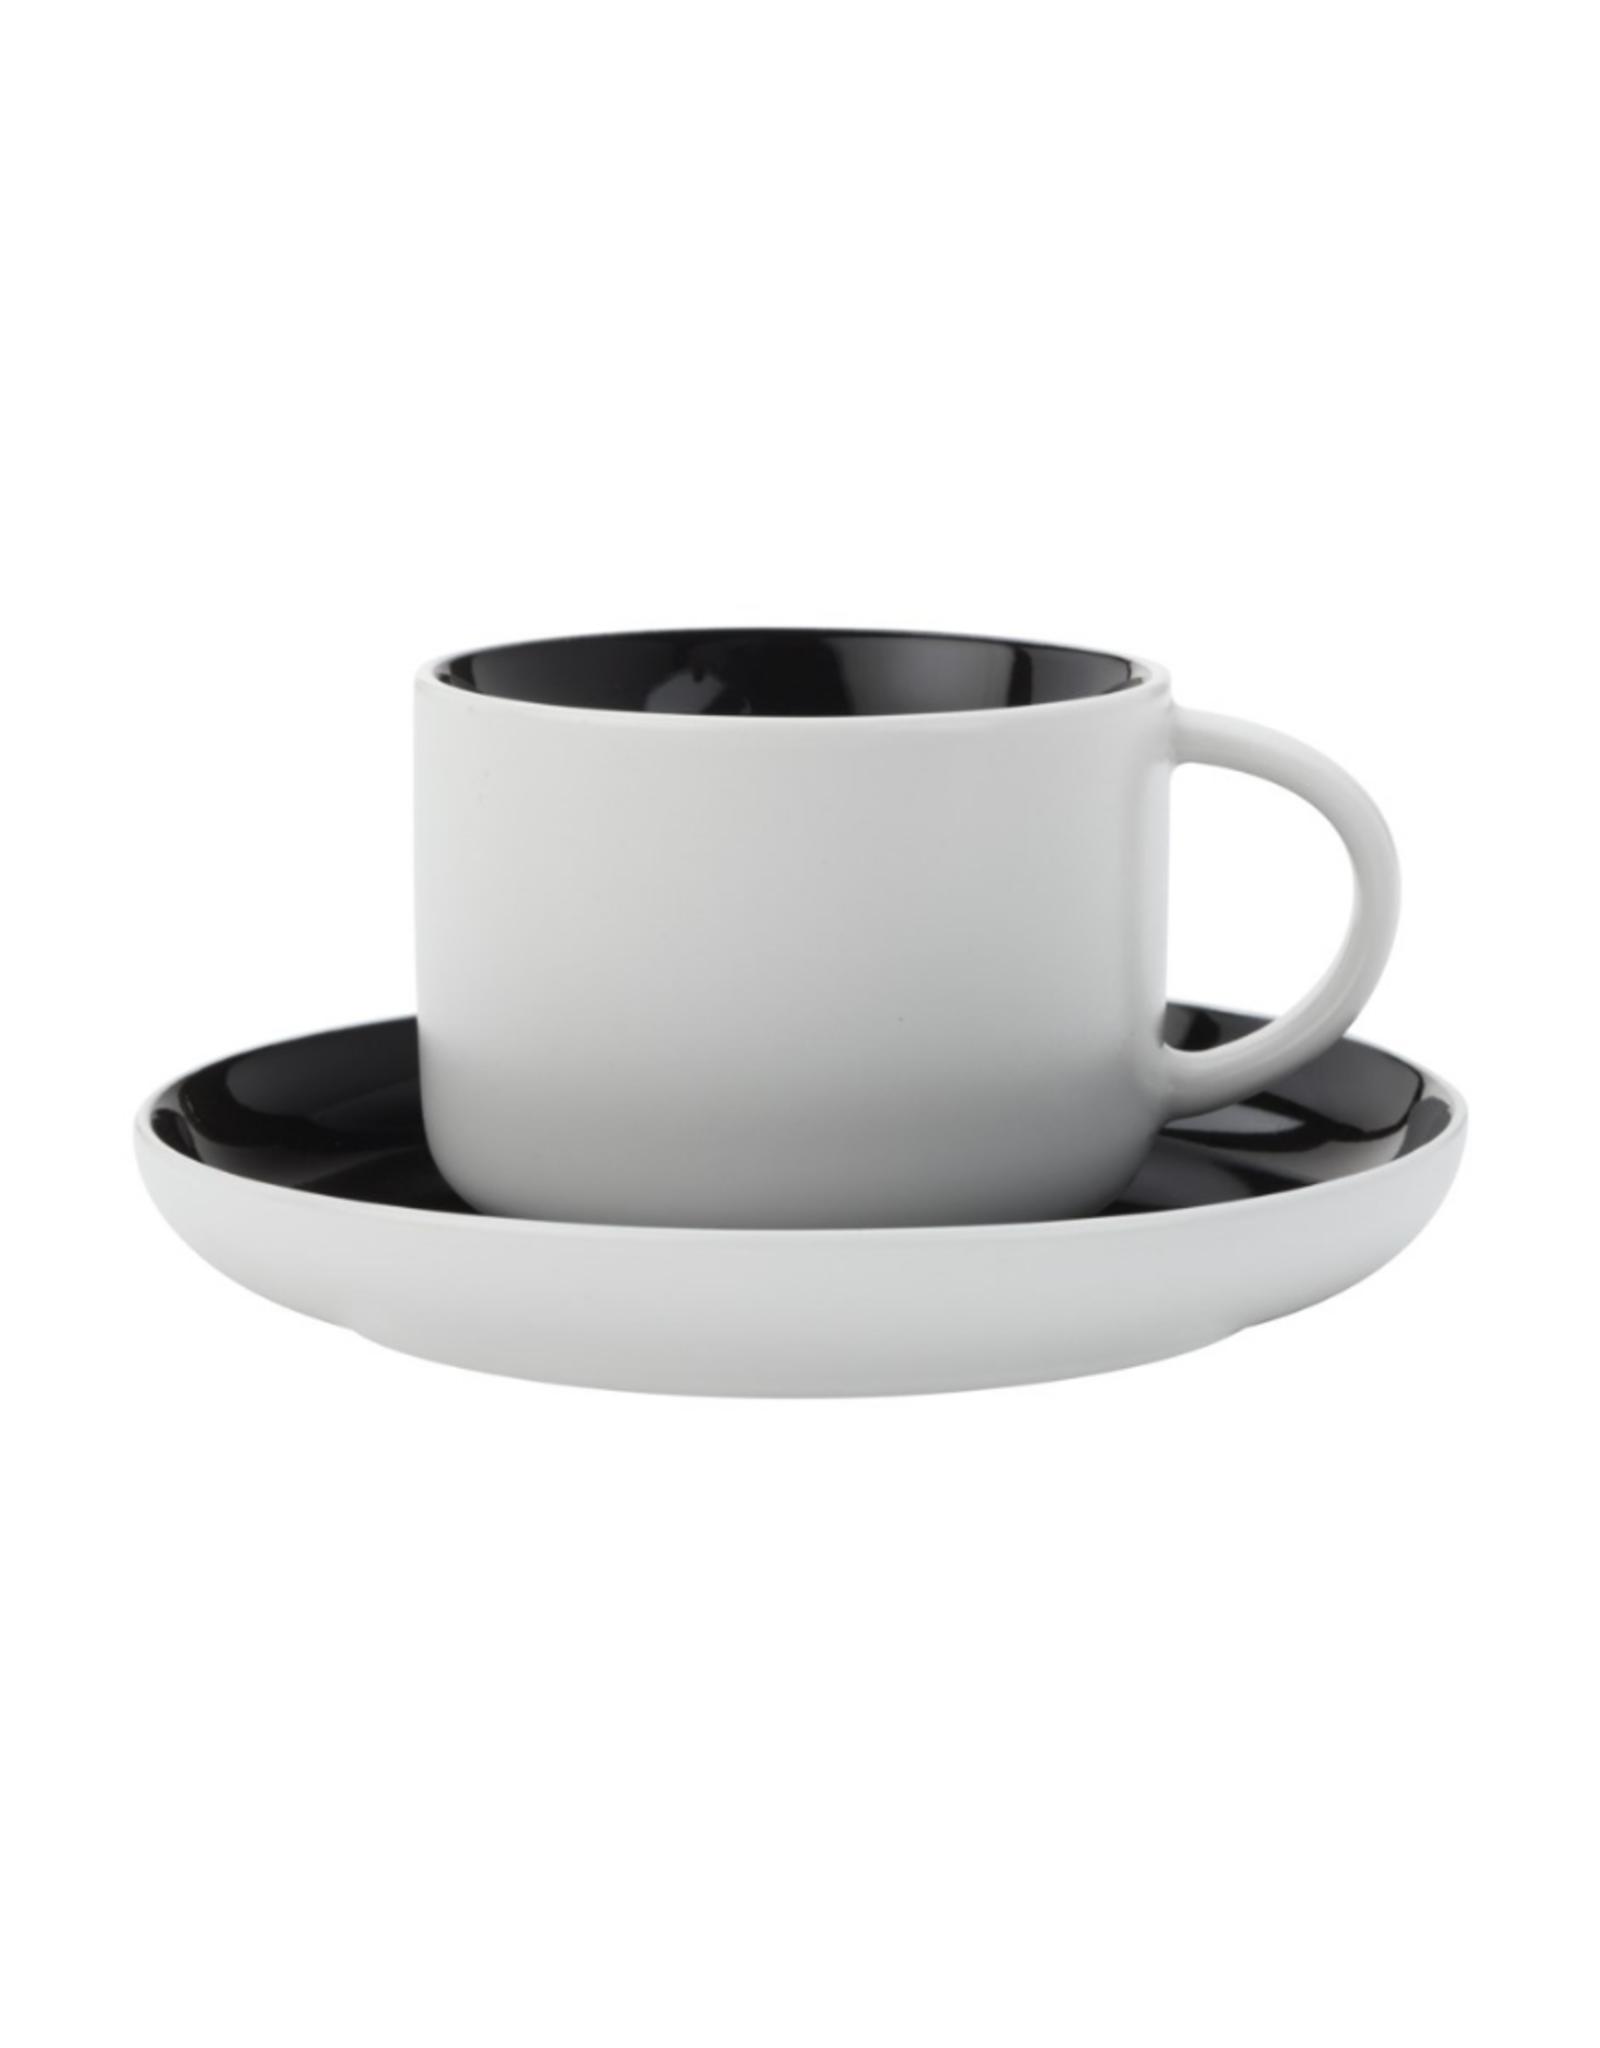 Maxwell Williams Tasse à cappuccino 250ml Tint noire